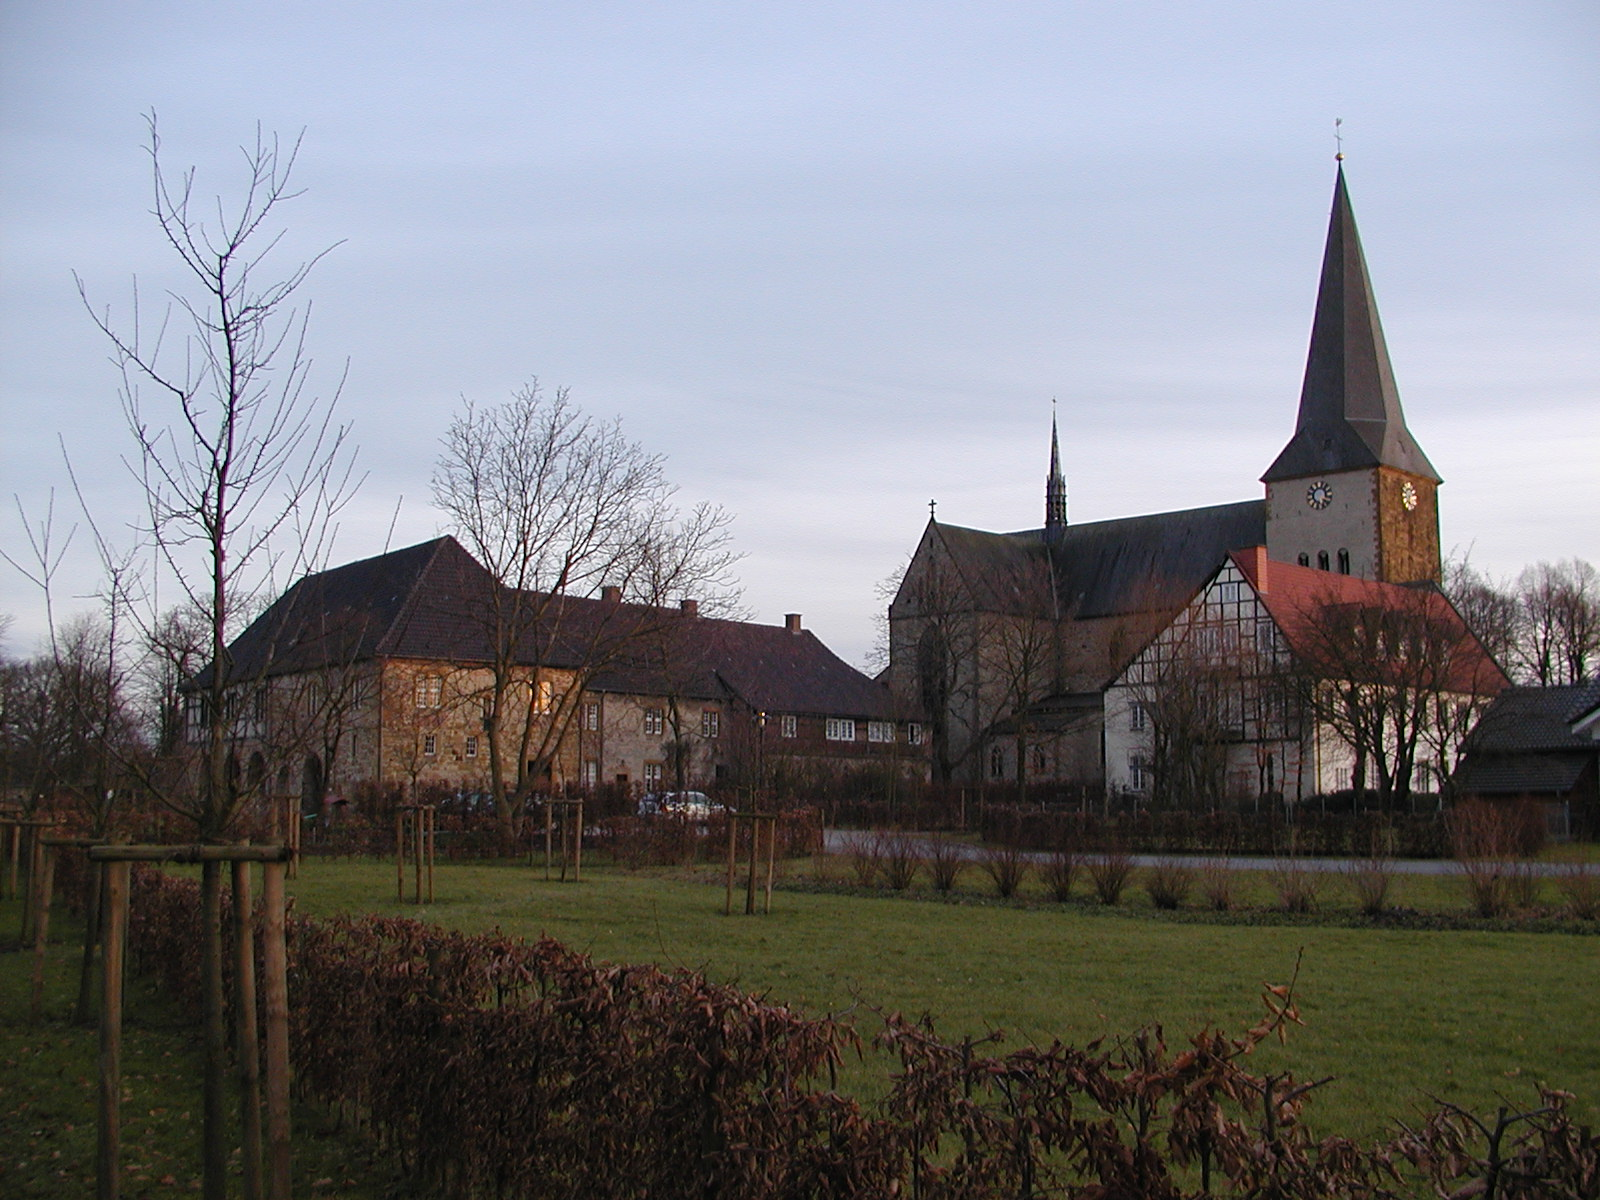 St-christina-herzebrock-mit-kloster-pfarheim.jpg